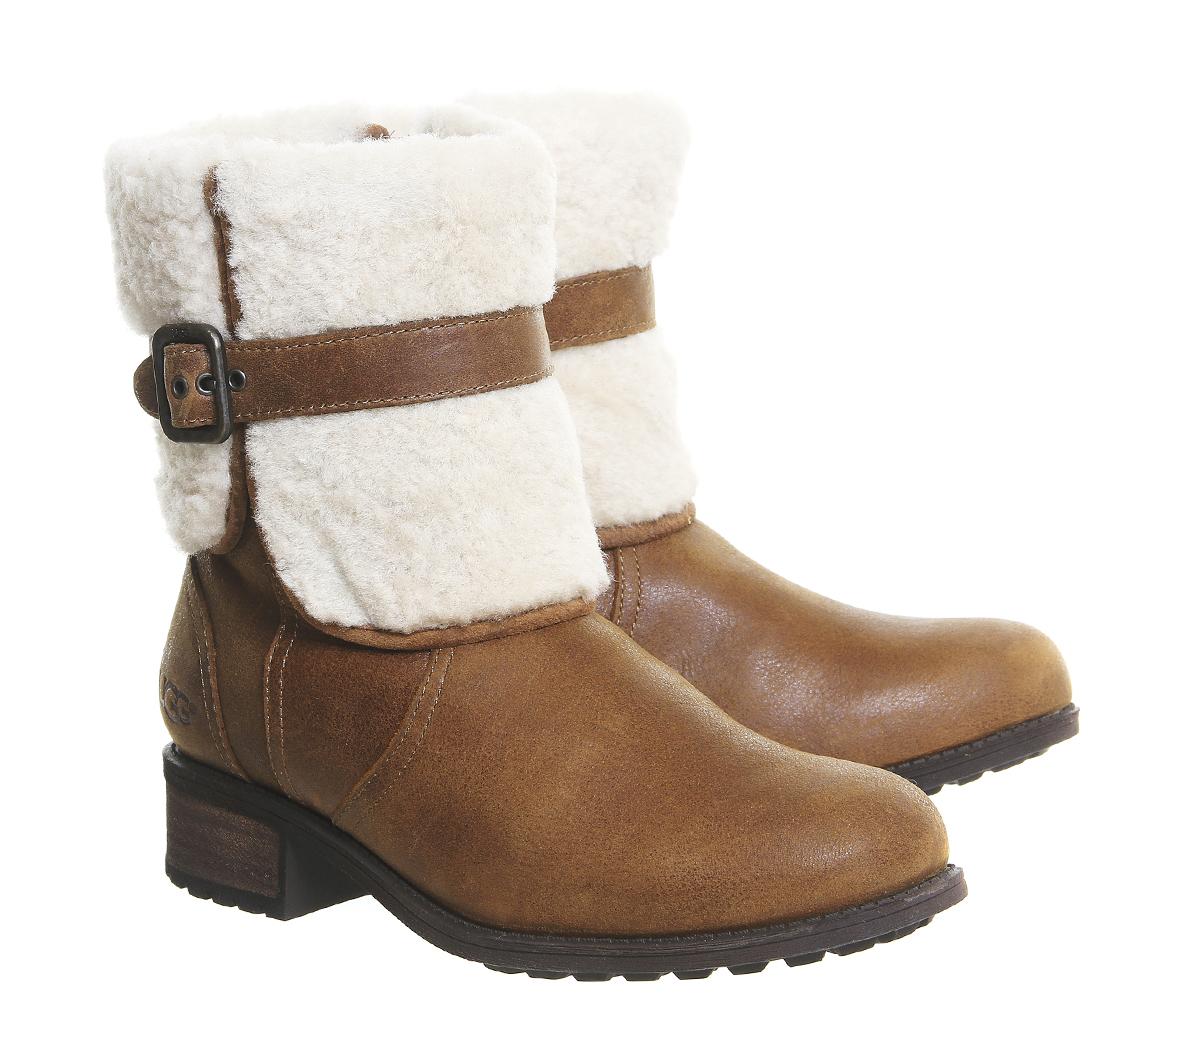 blayre ugg boots uk